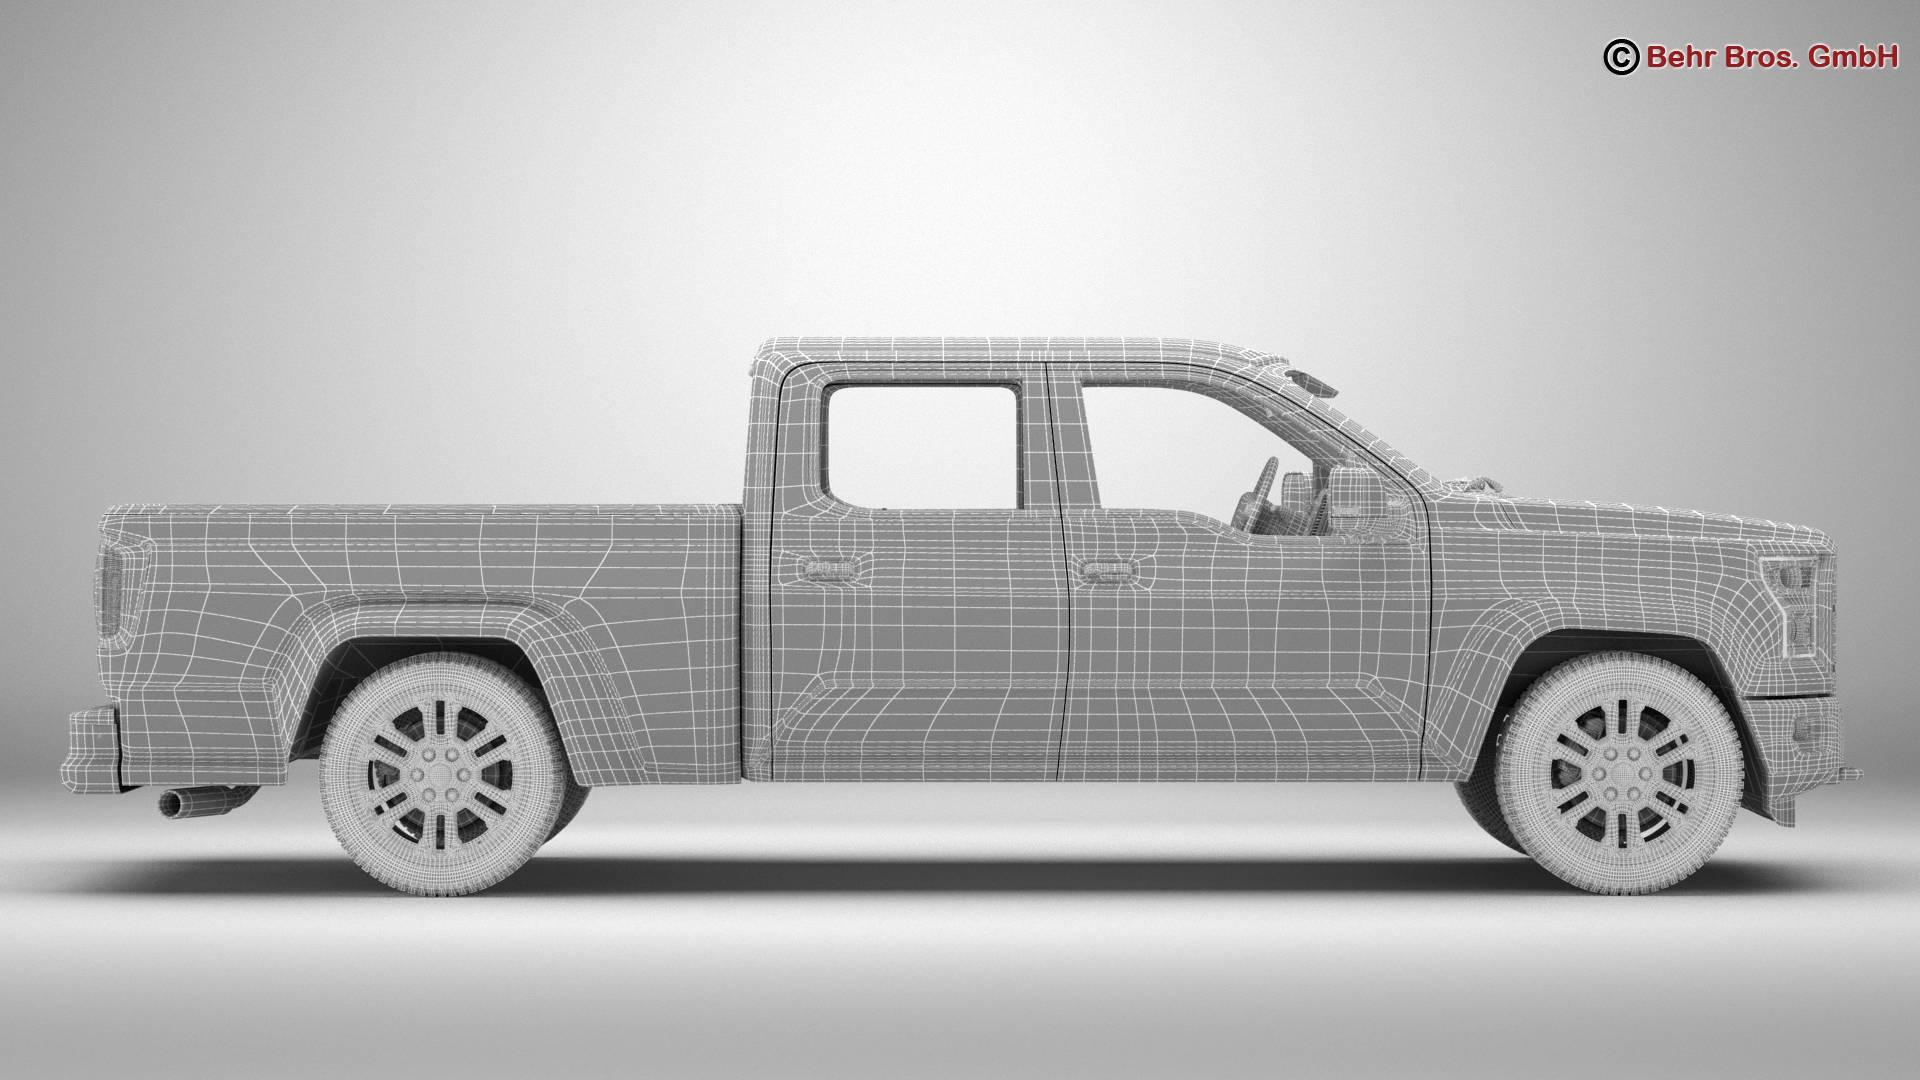 generic pickup 3d model 3ds max fbx c4d lwo ma mb obj 219887